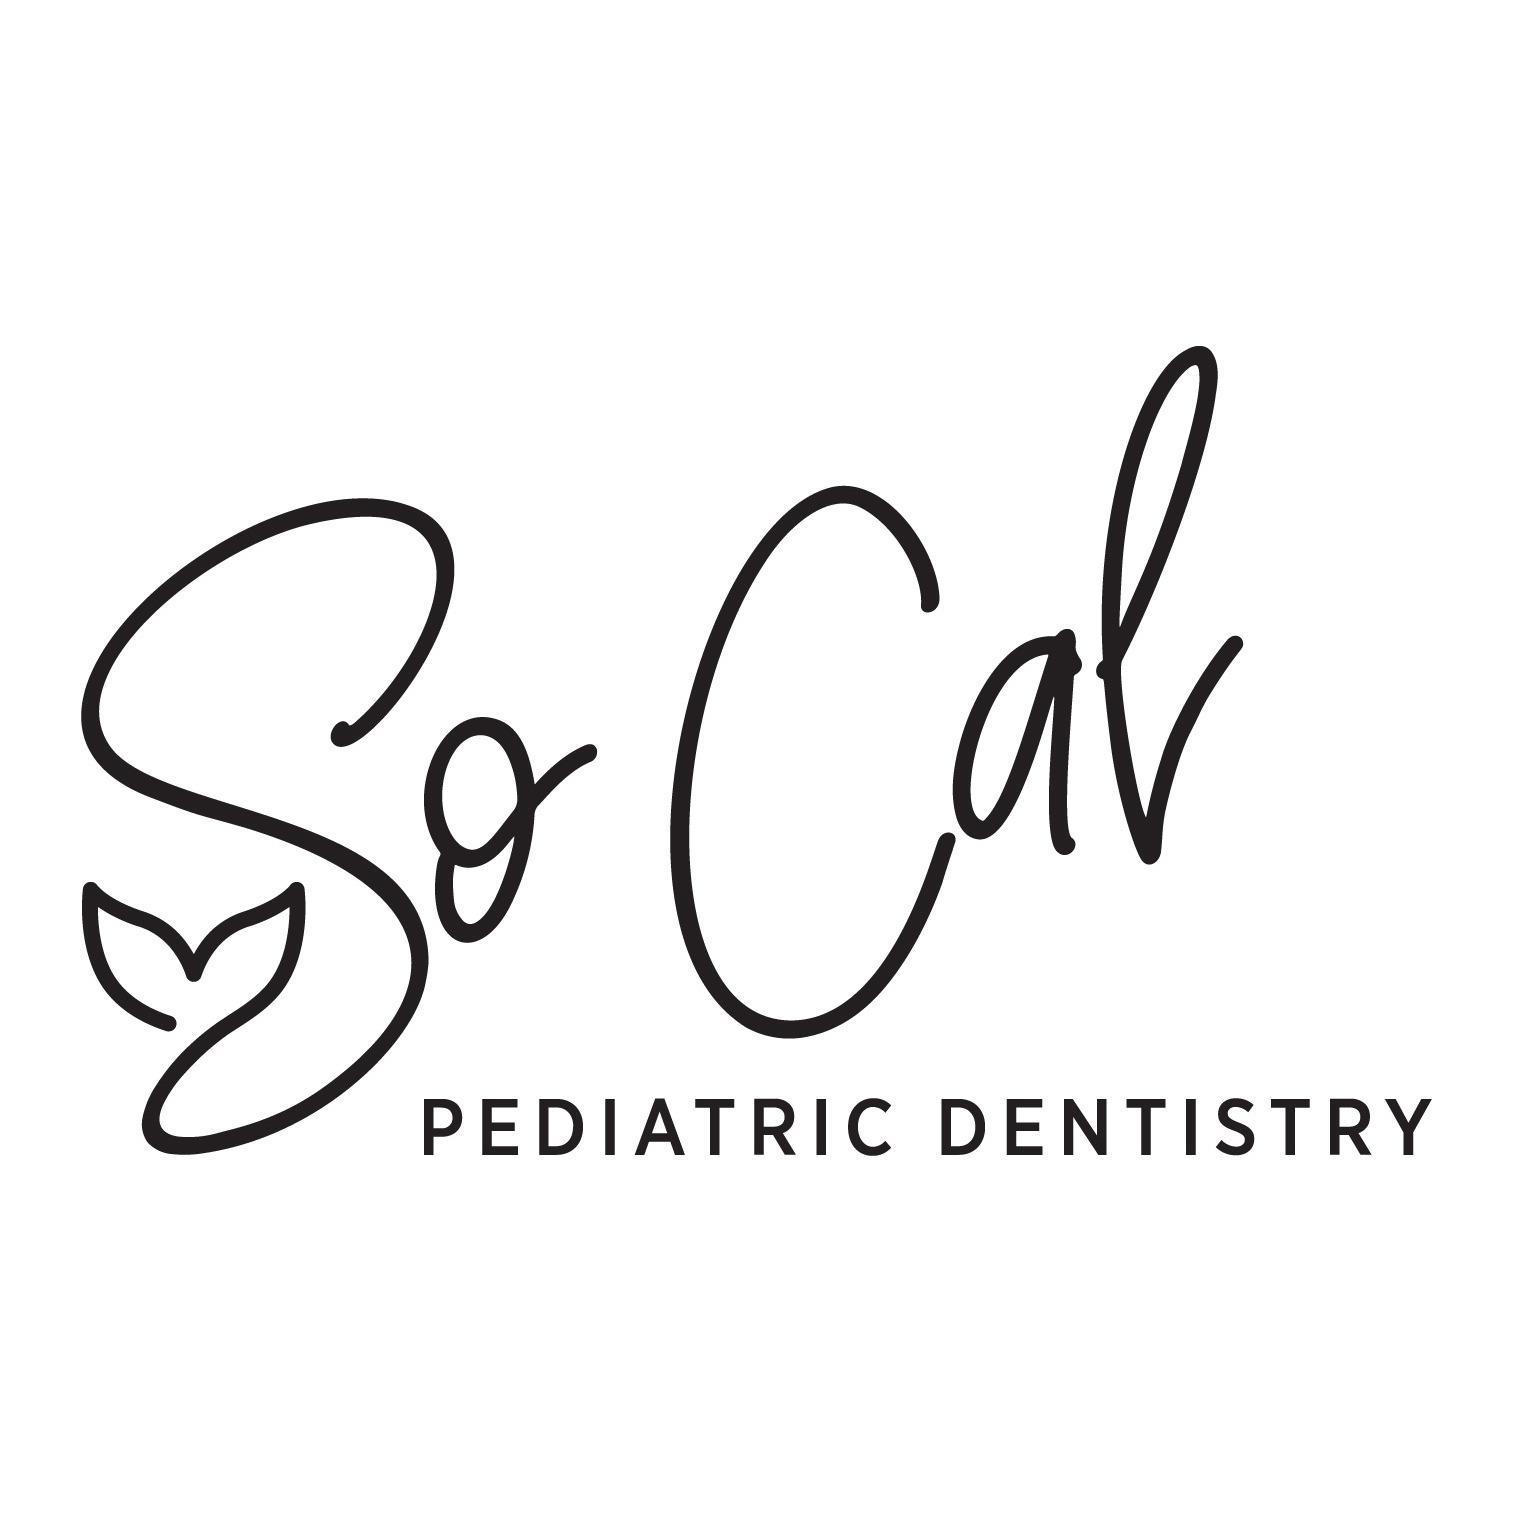 SoCal Pediatric Dentistry